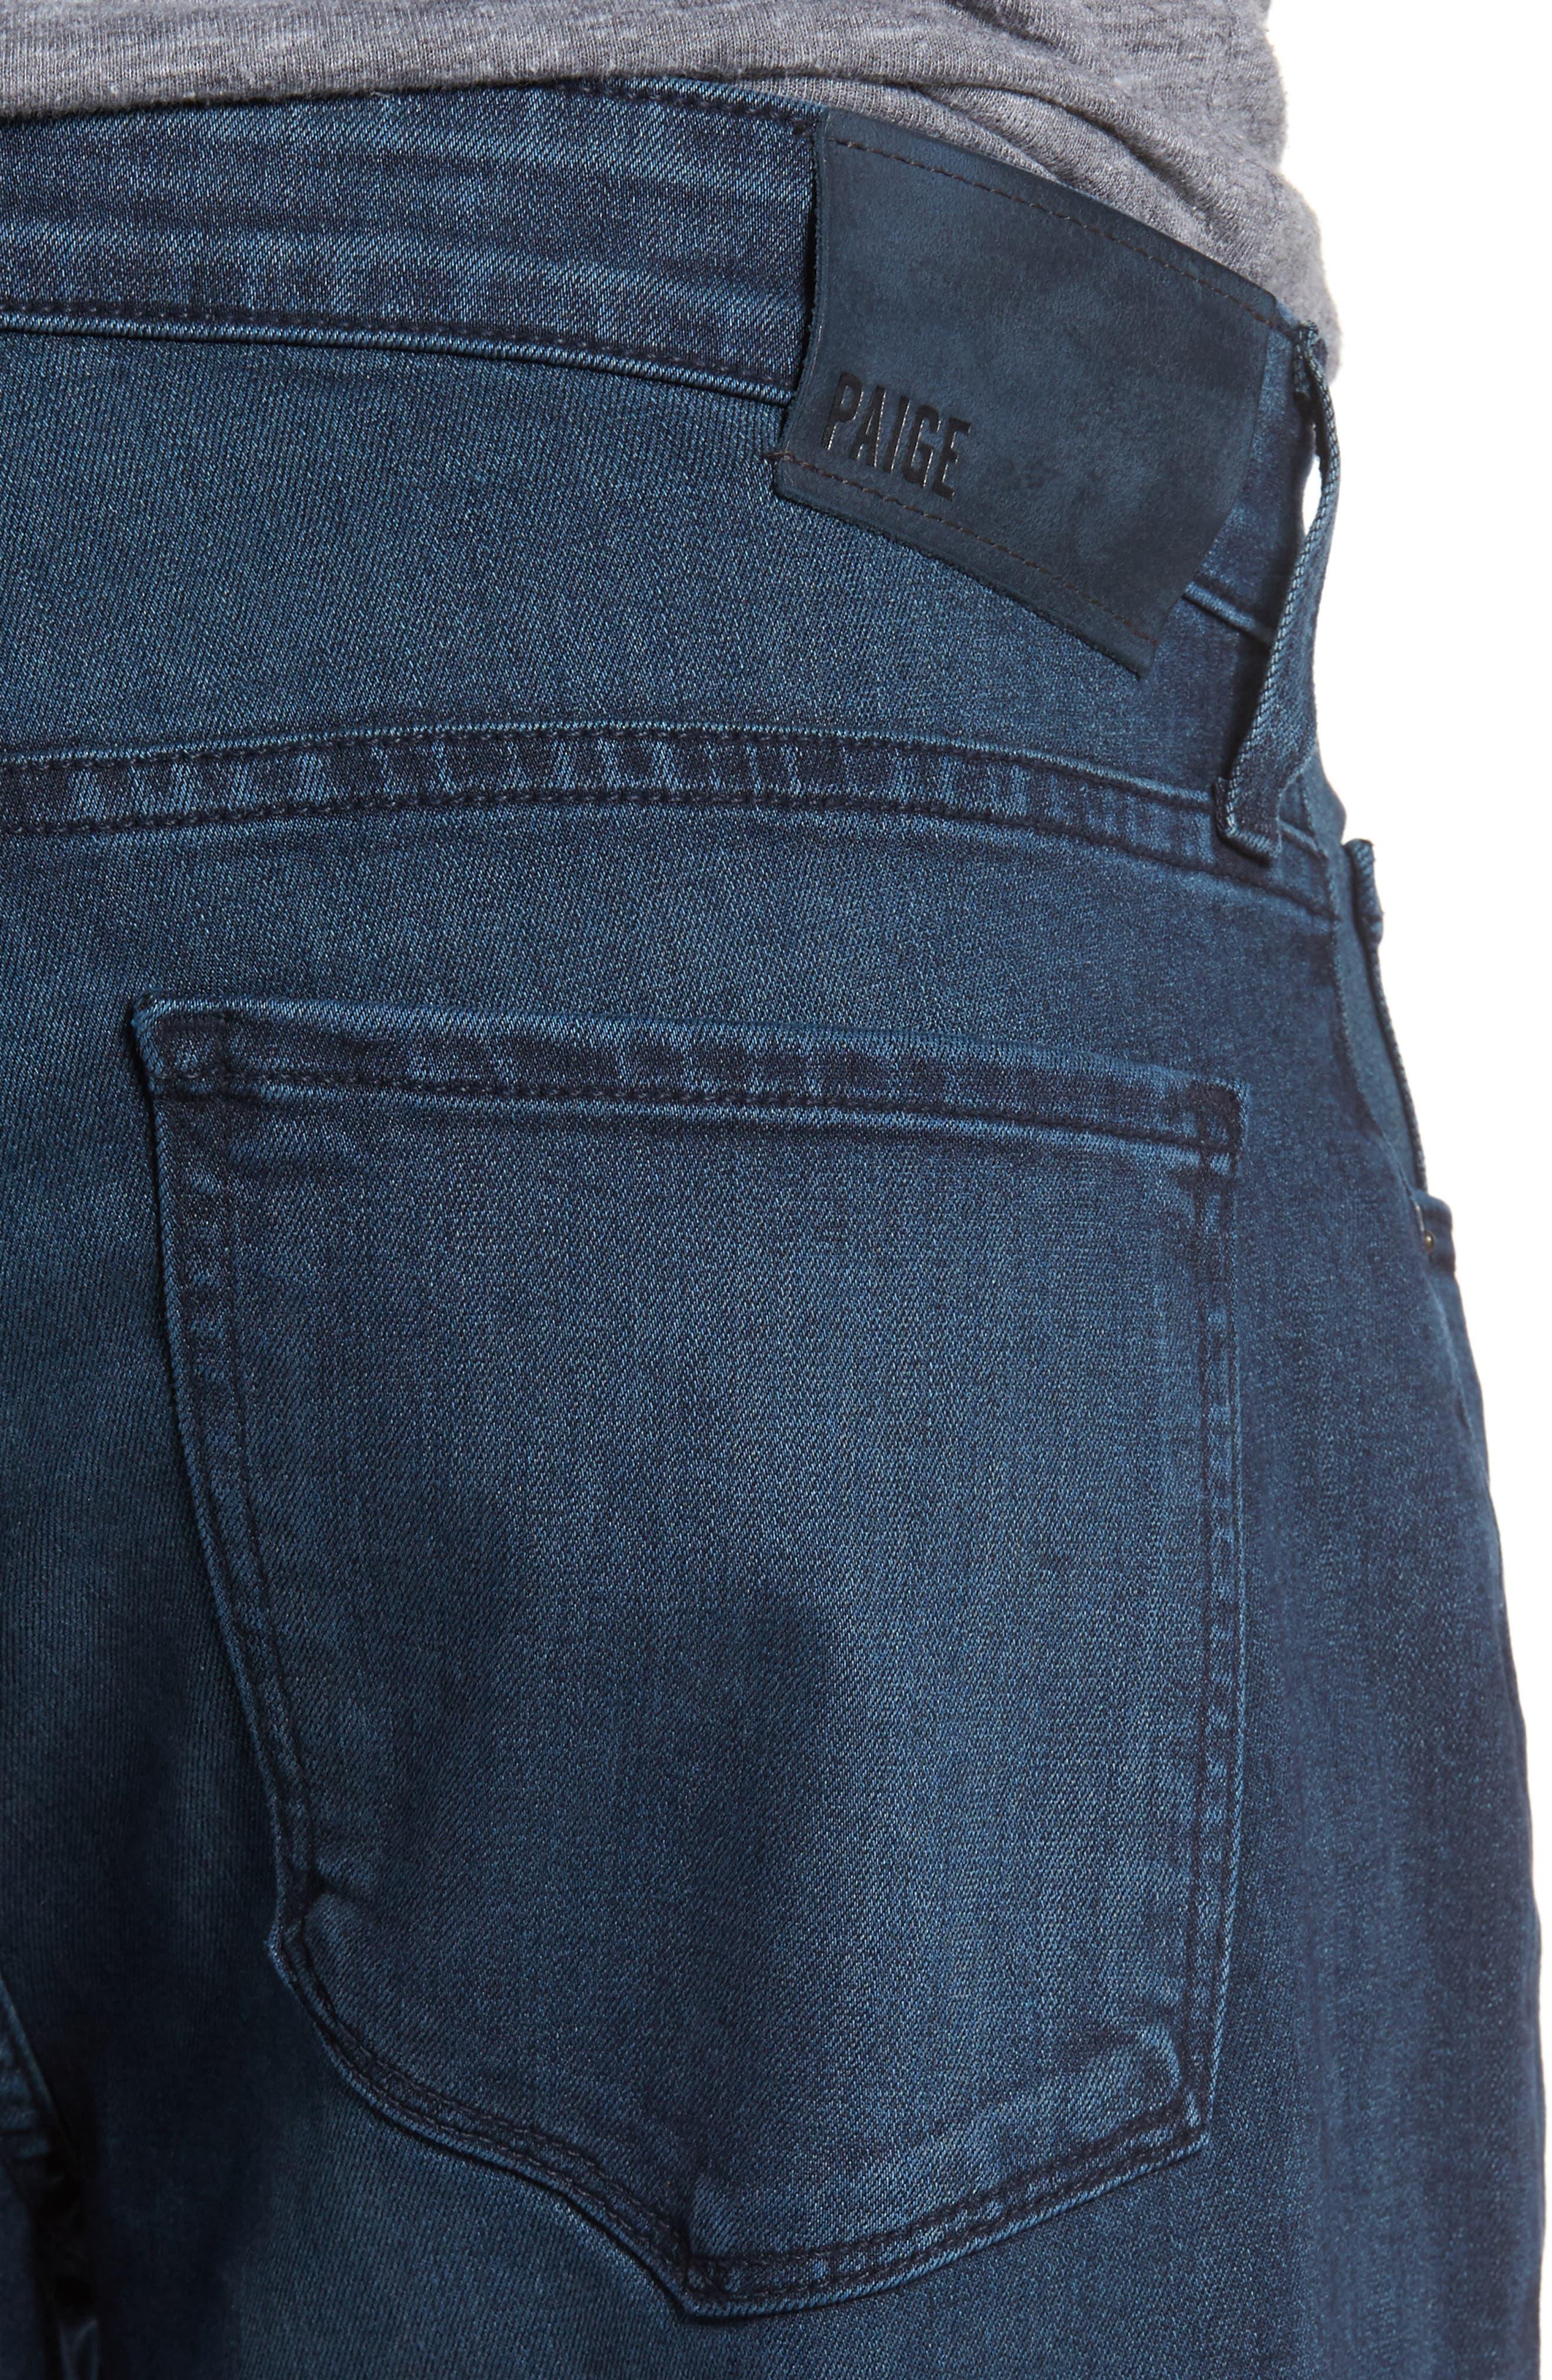 Transcend - Federal Slim Straight Fit Jeans,                             Alternate thumbnail 4, color,                             Elroy